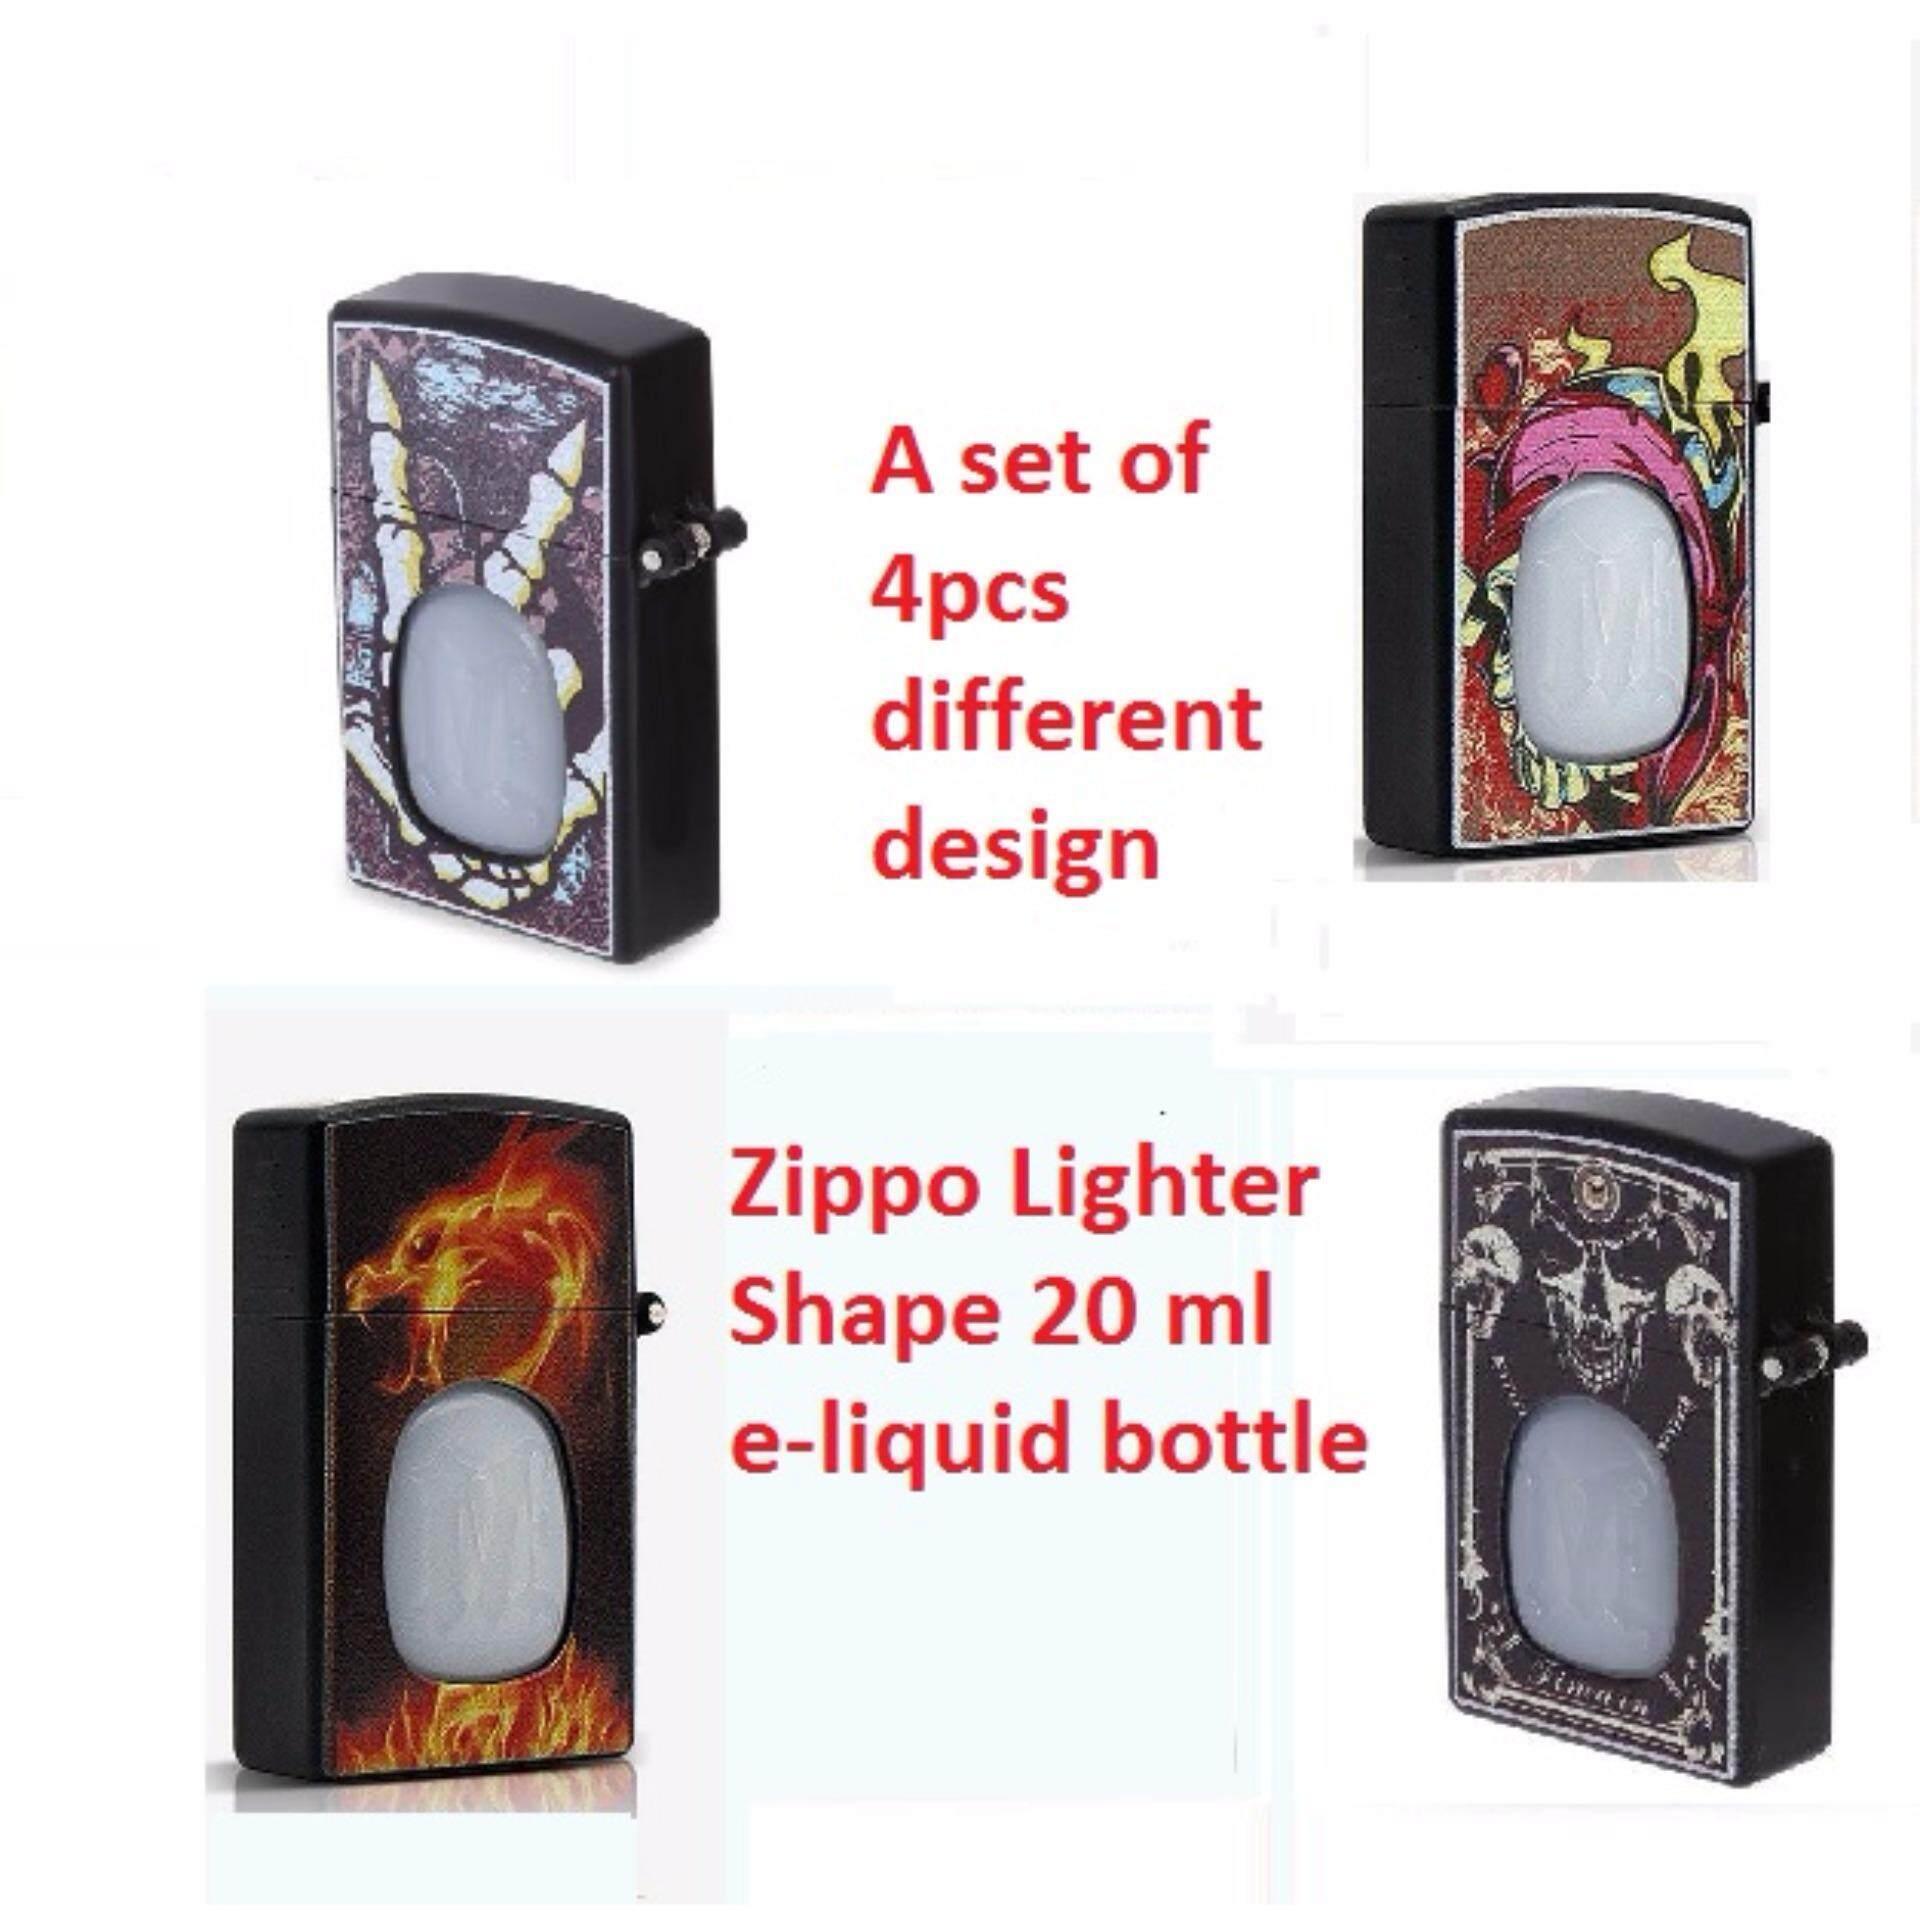 Zippo Lighter Shape E-Liquid Bottle 20ml (4pcs set)